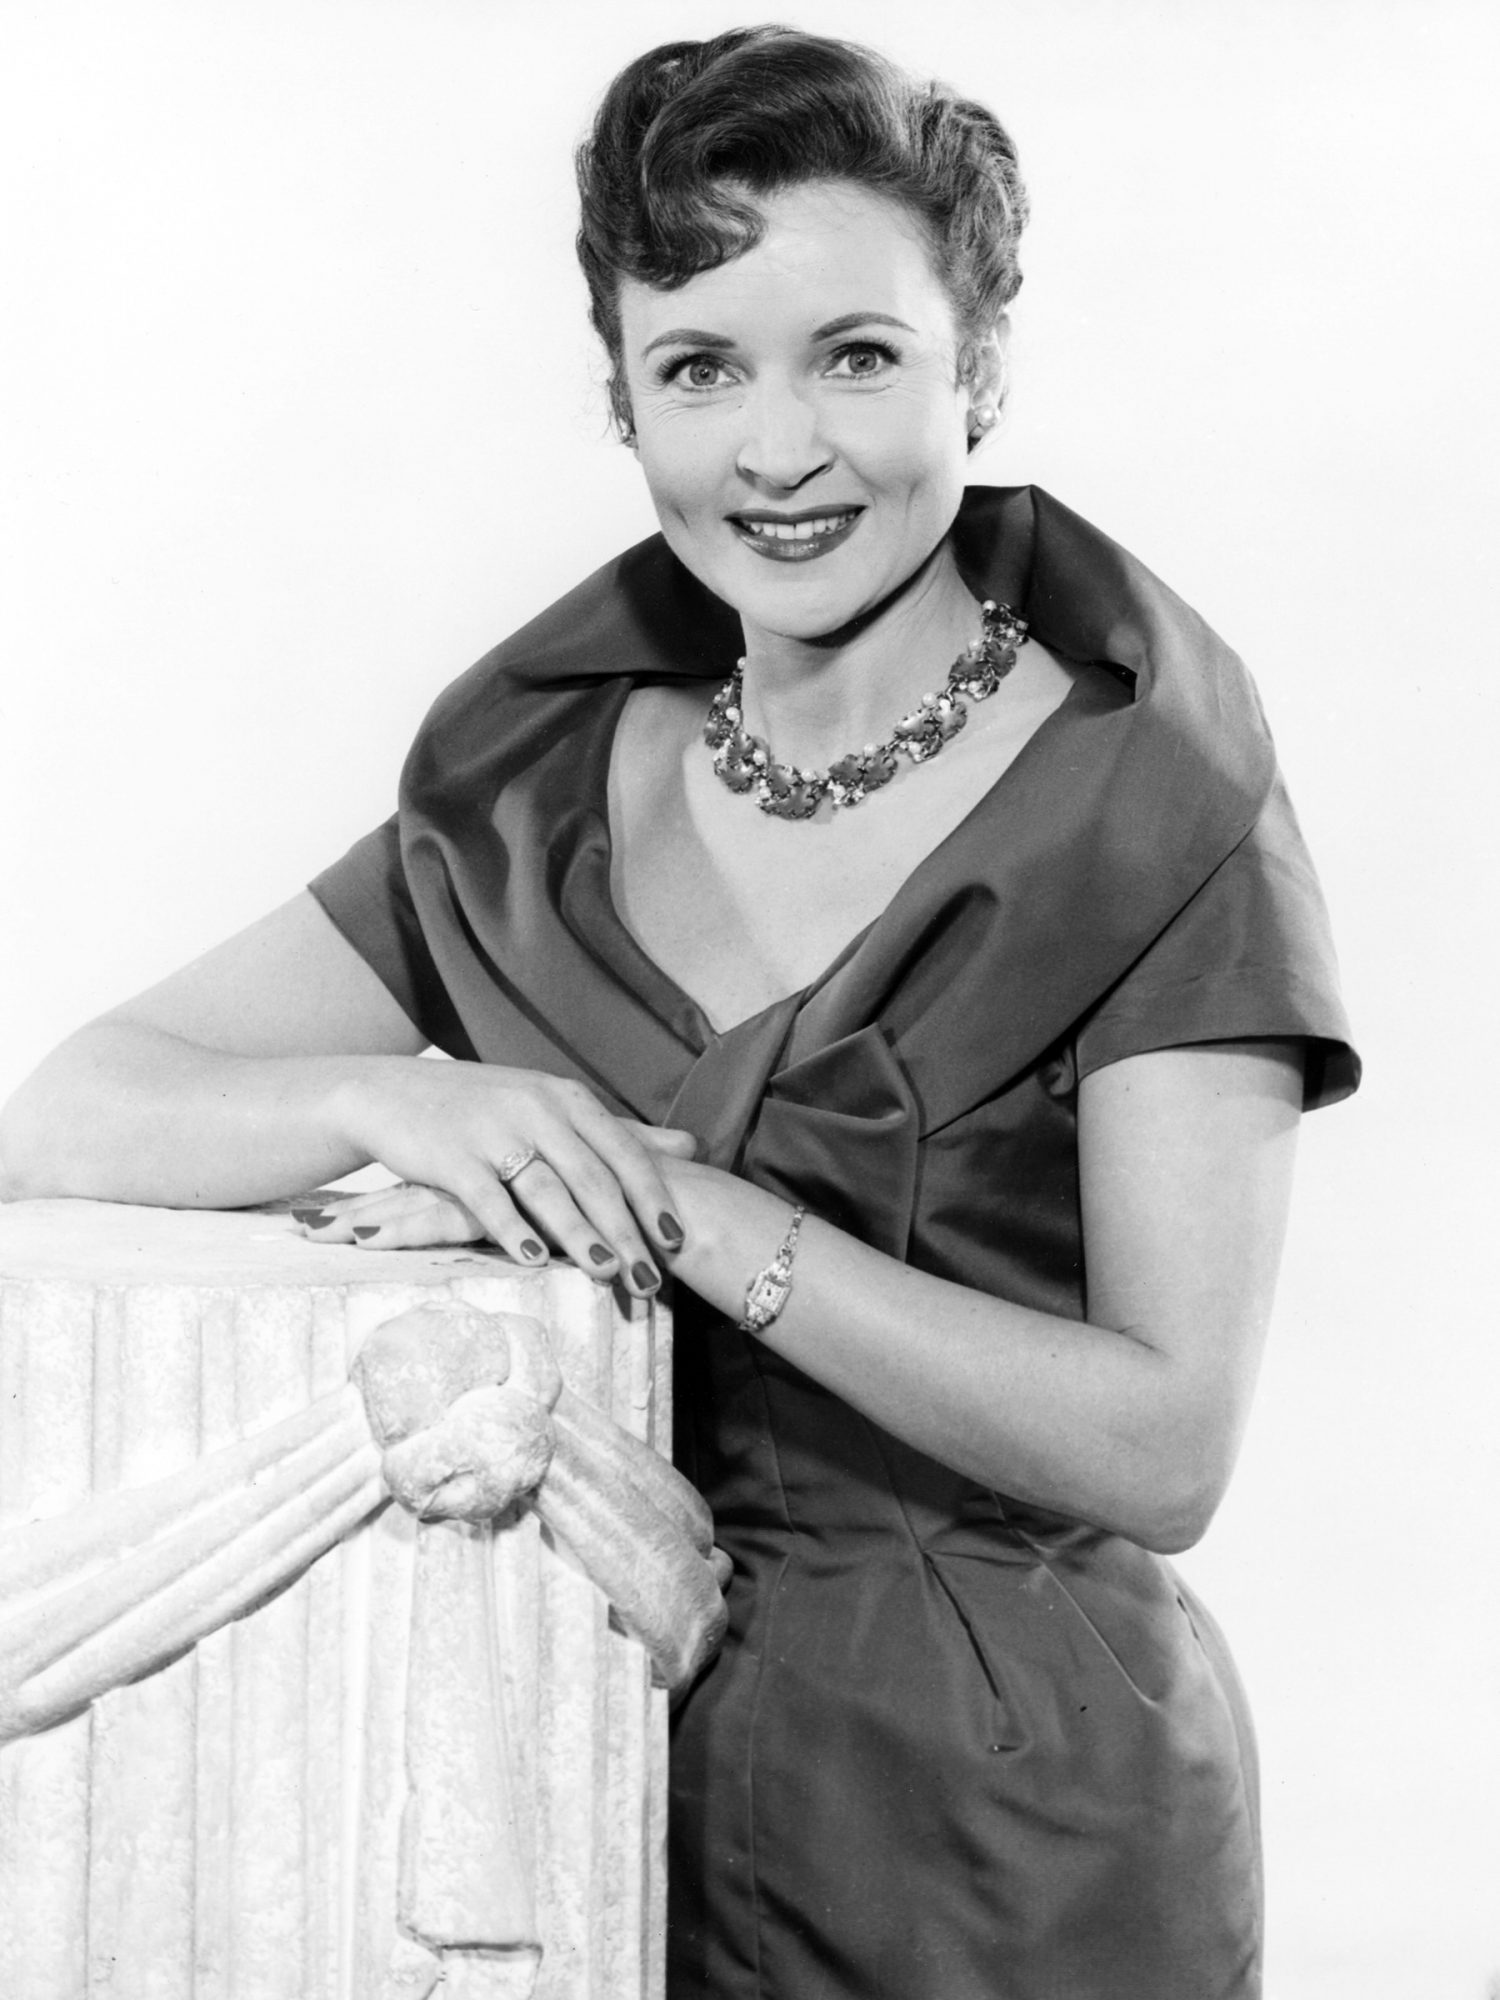 Betty White Photos Through the Years | EW.com